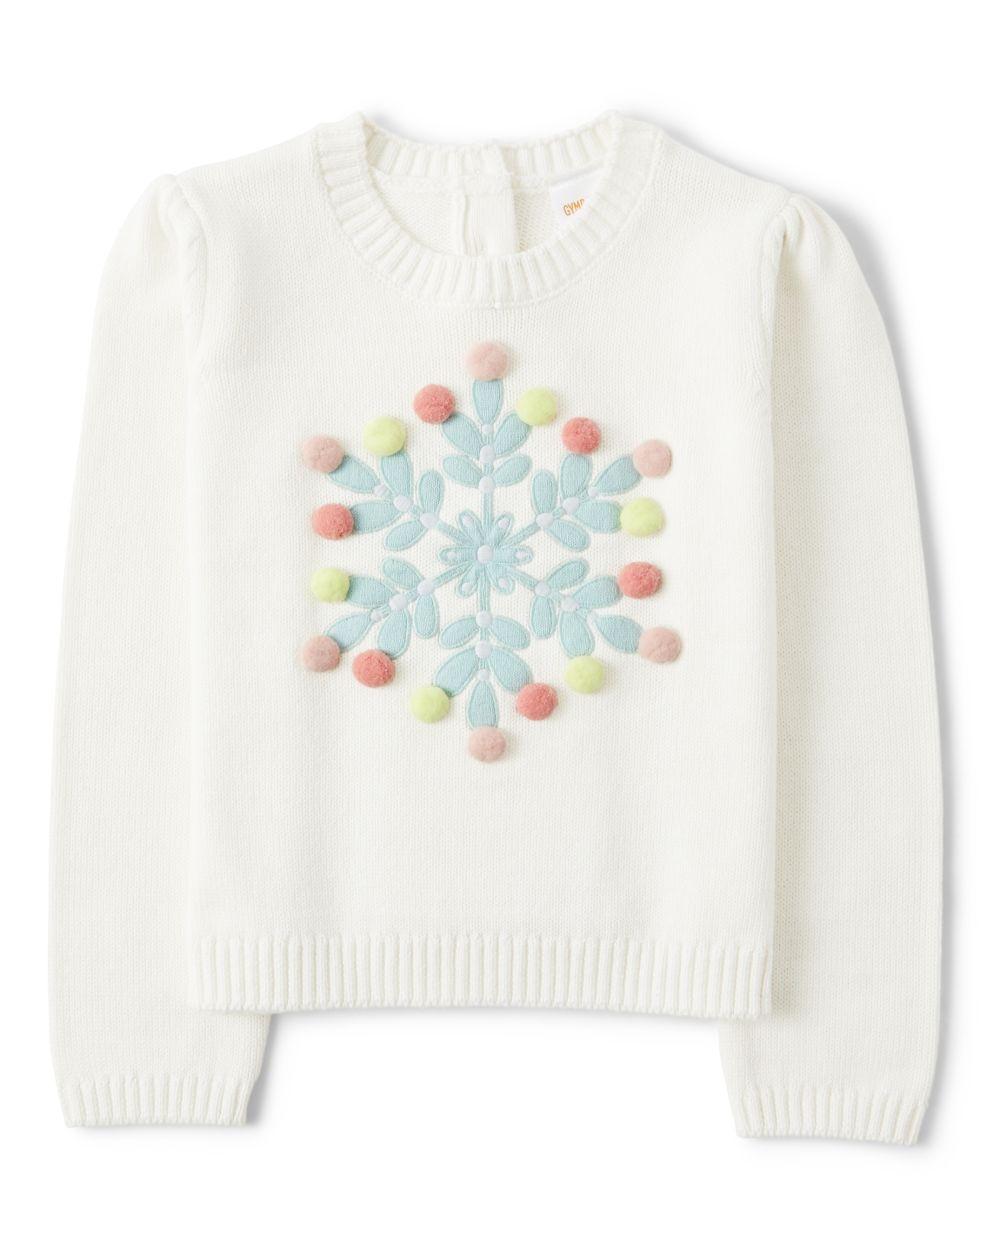 Girls Pom Pom Snowflake Sweater - Snow Princess